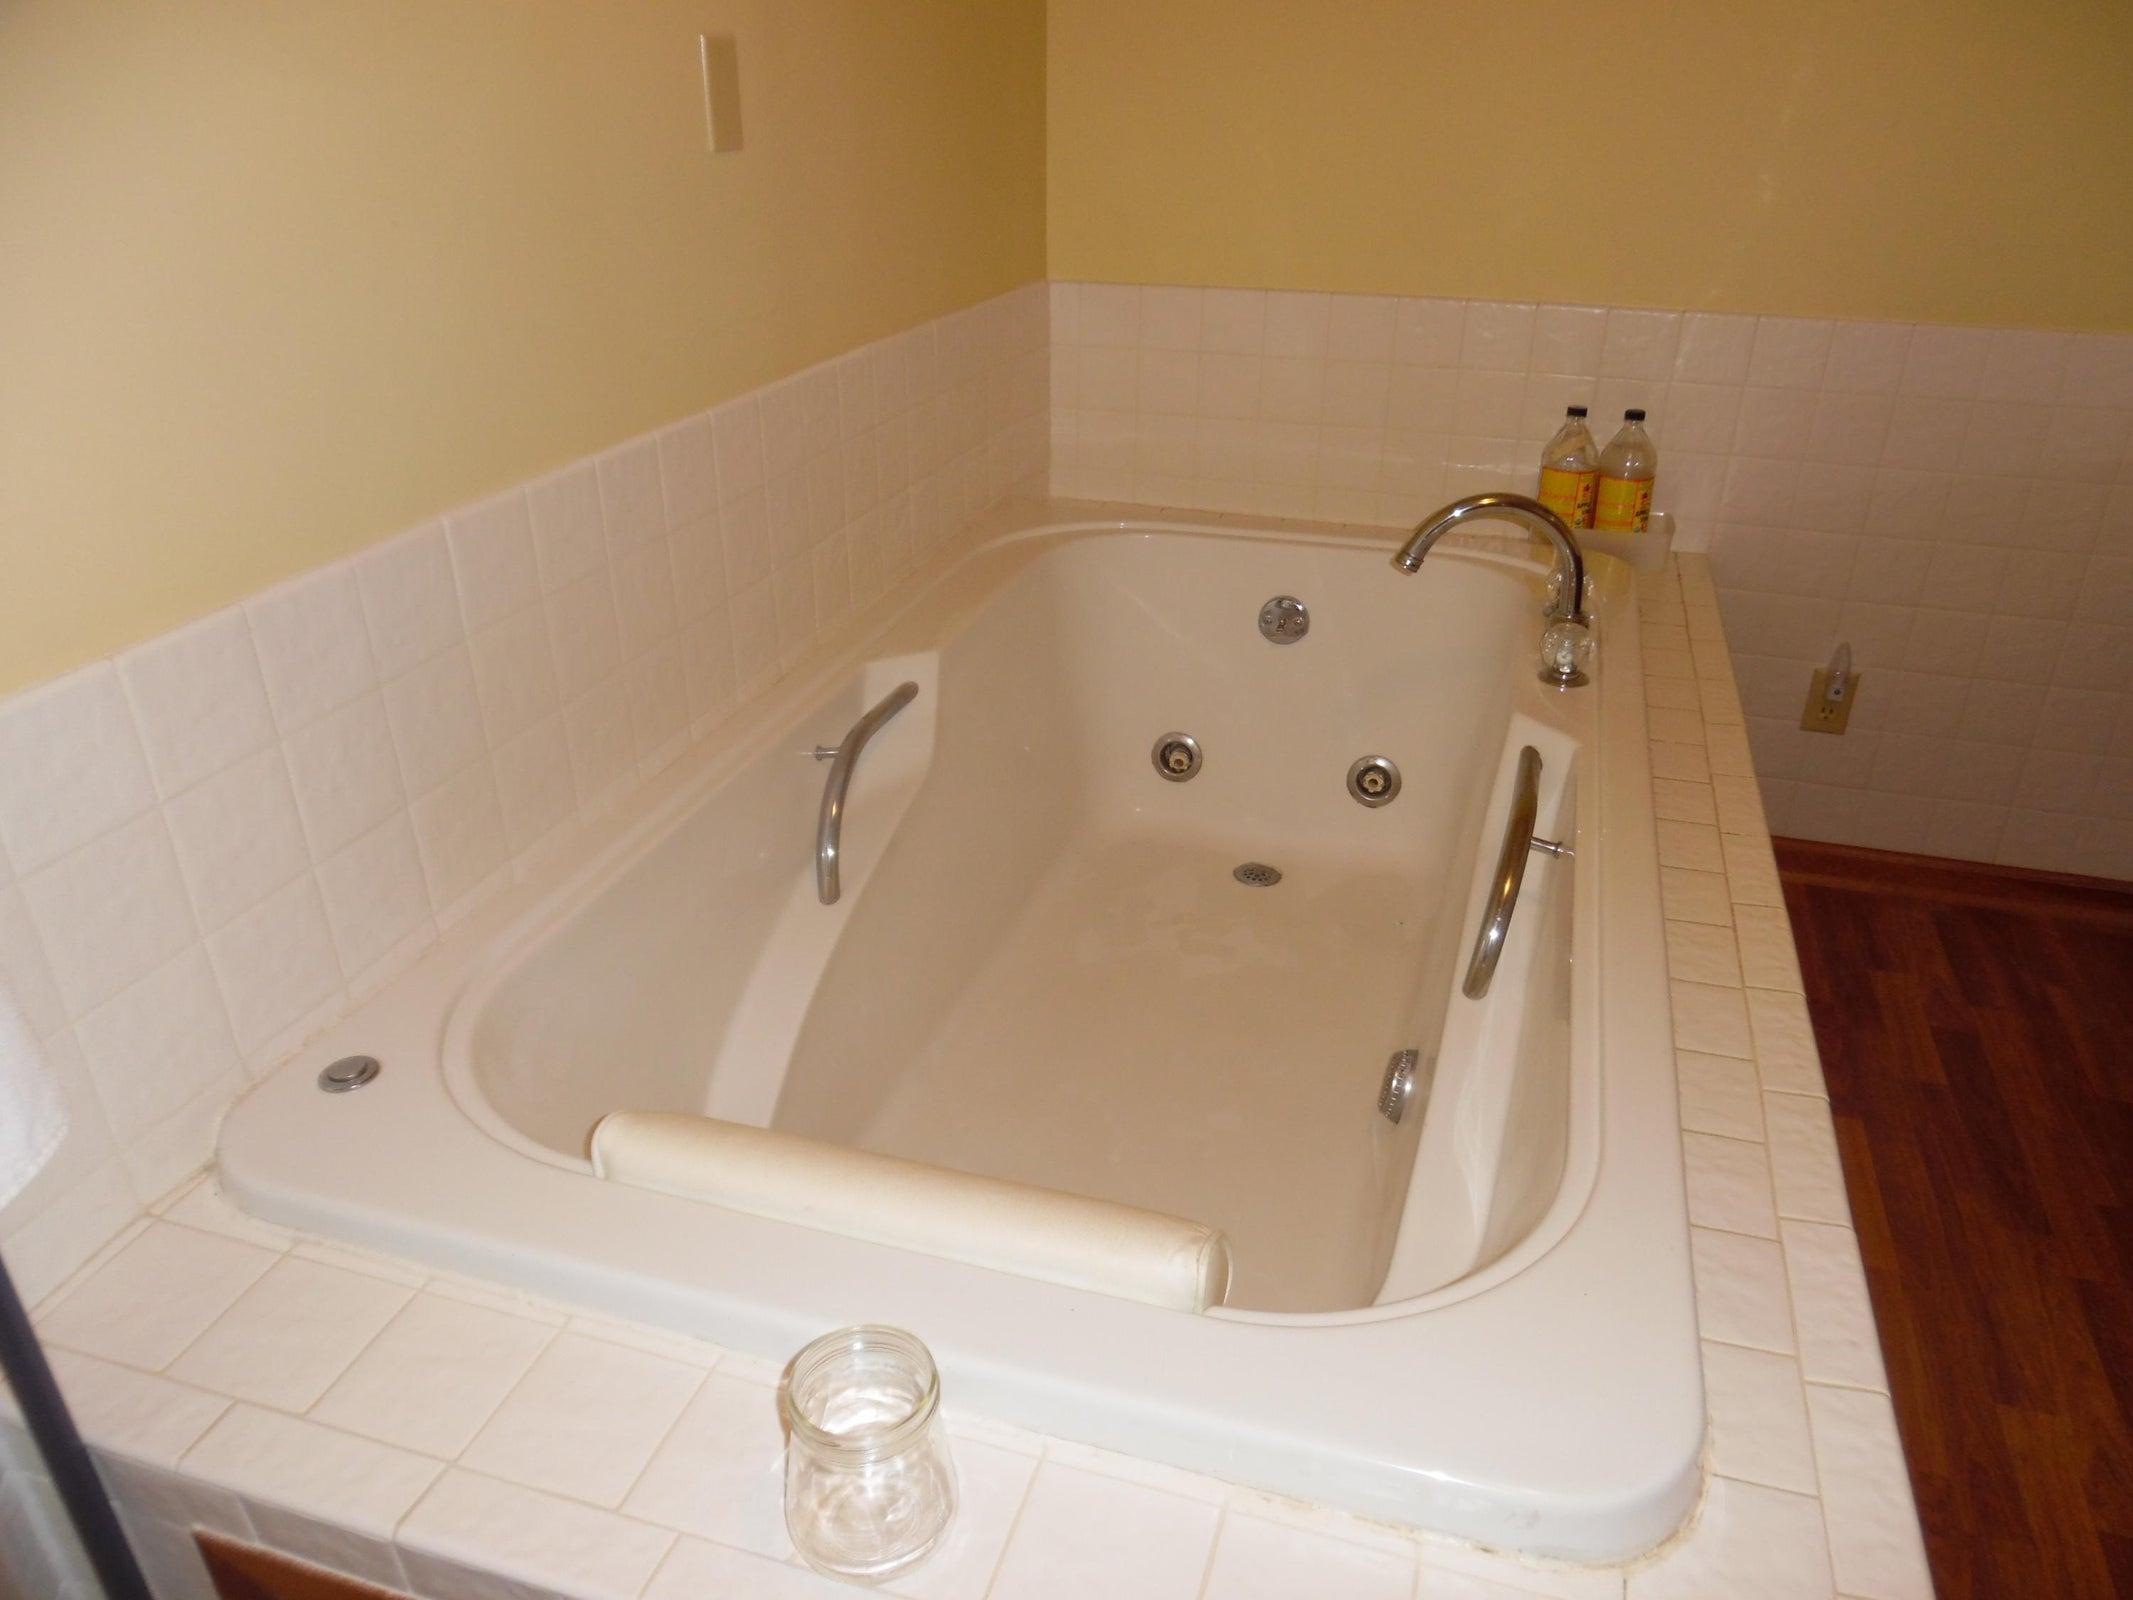 Oversized Whirlpool Tub